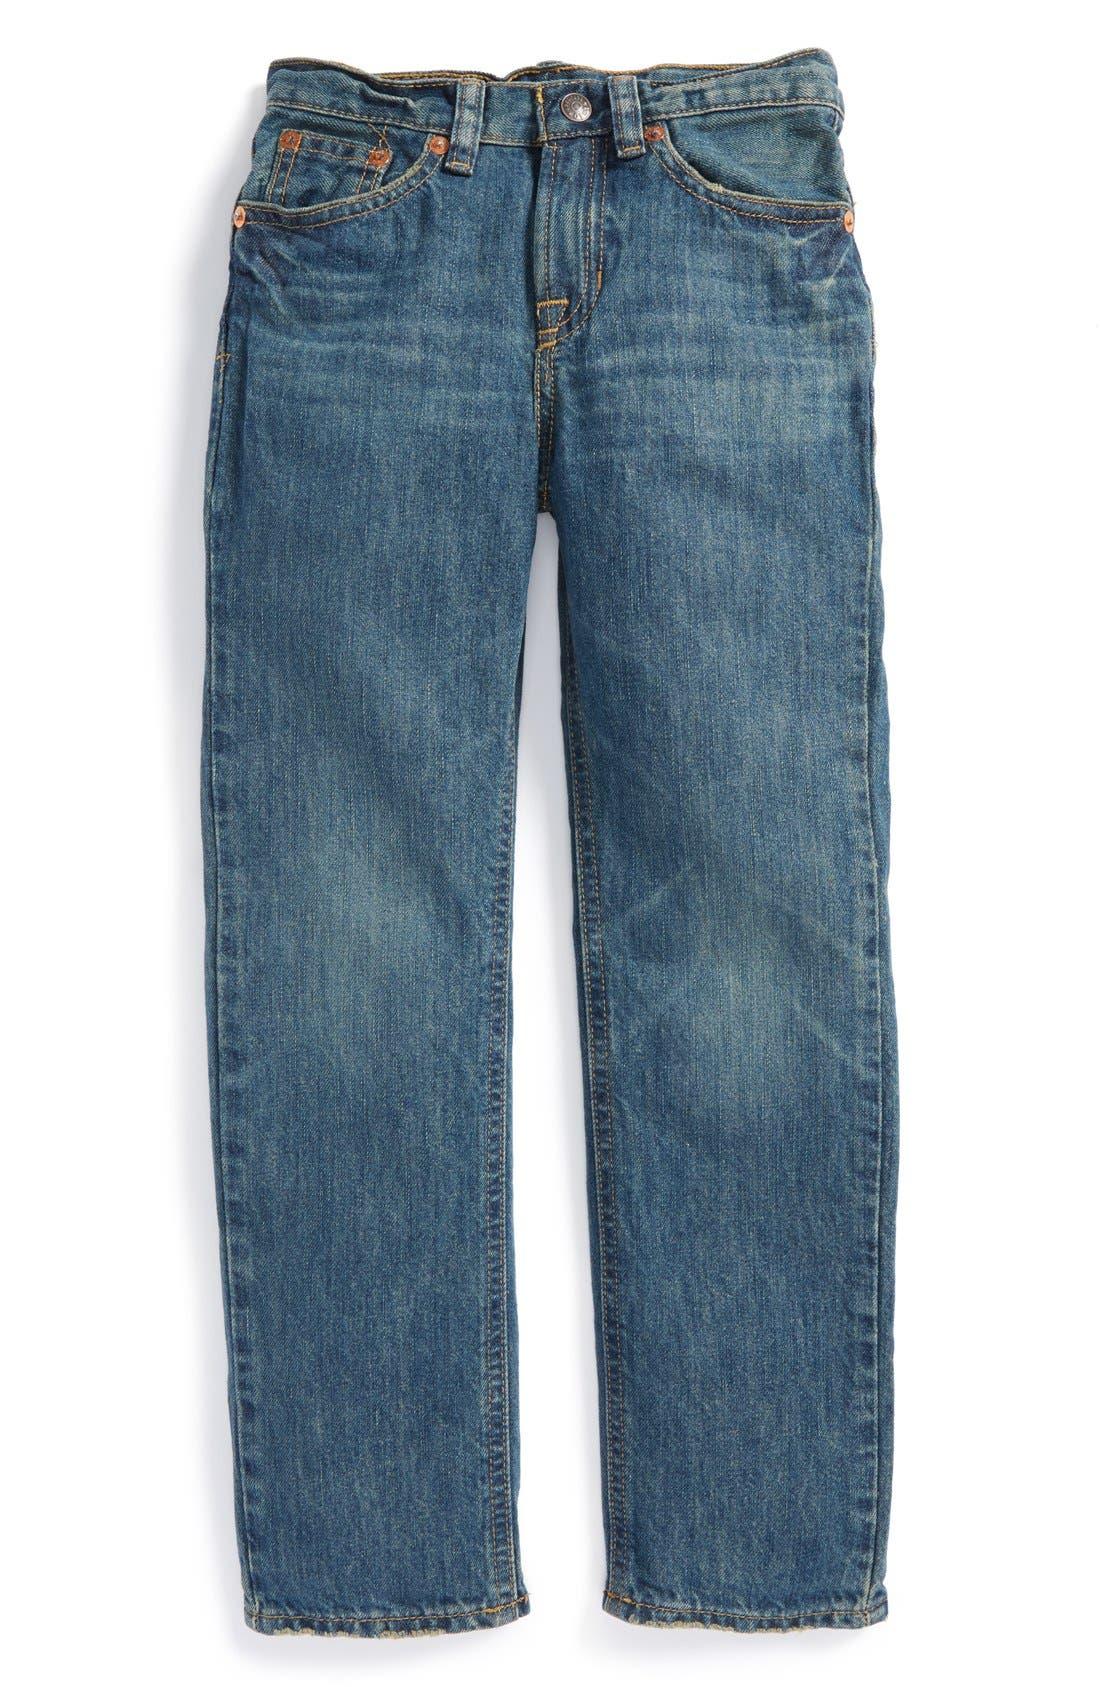 Main Image - Ralph Lauren 'Mott' Slim Fit Jeans (Little Boys)